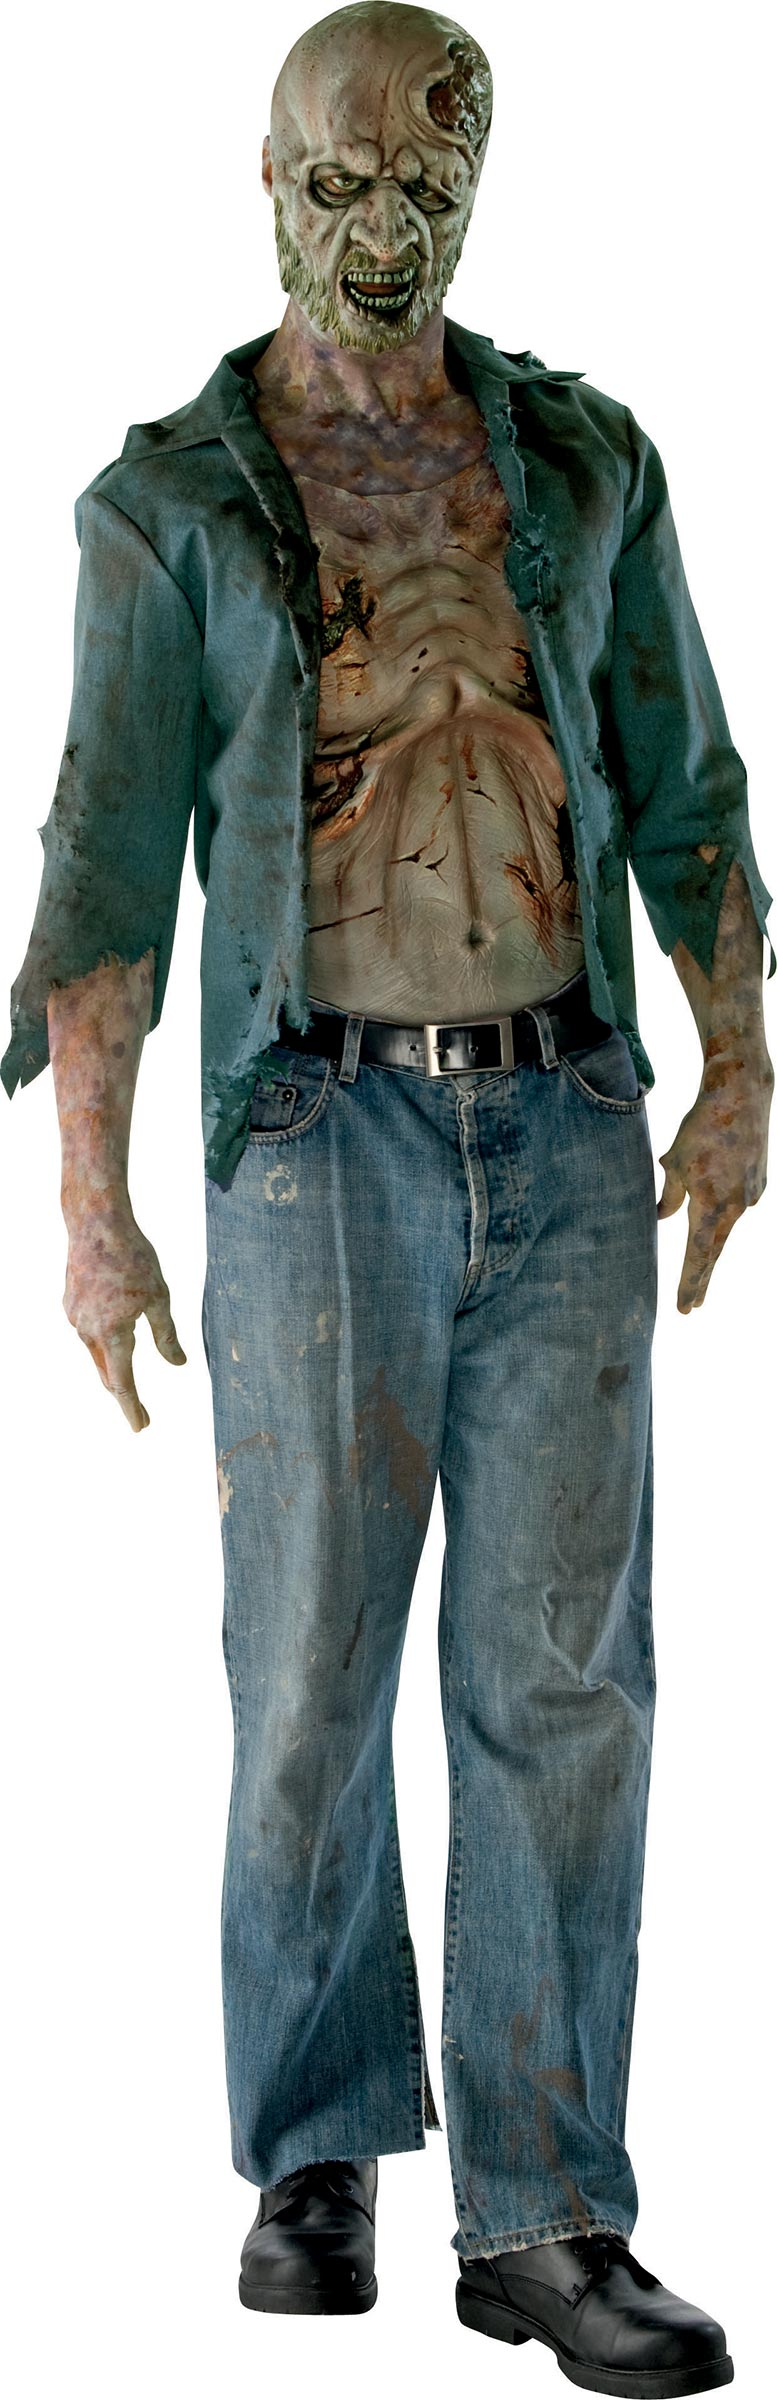 d guisement the walking dead homme costume mort vivant soir e halloween. Black Bedroom Furniture Sets. Home Design Ideas